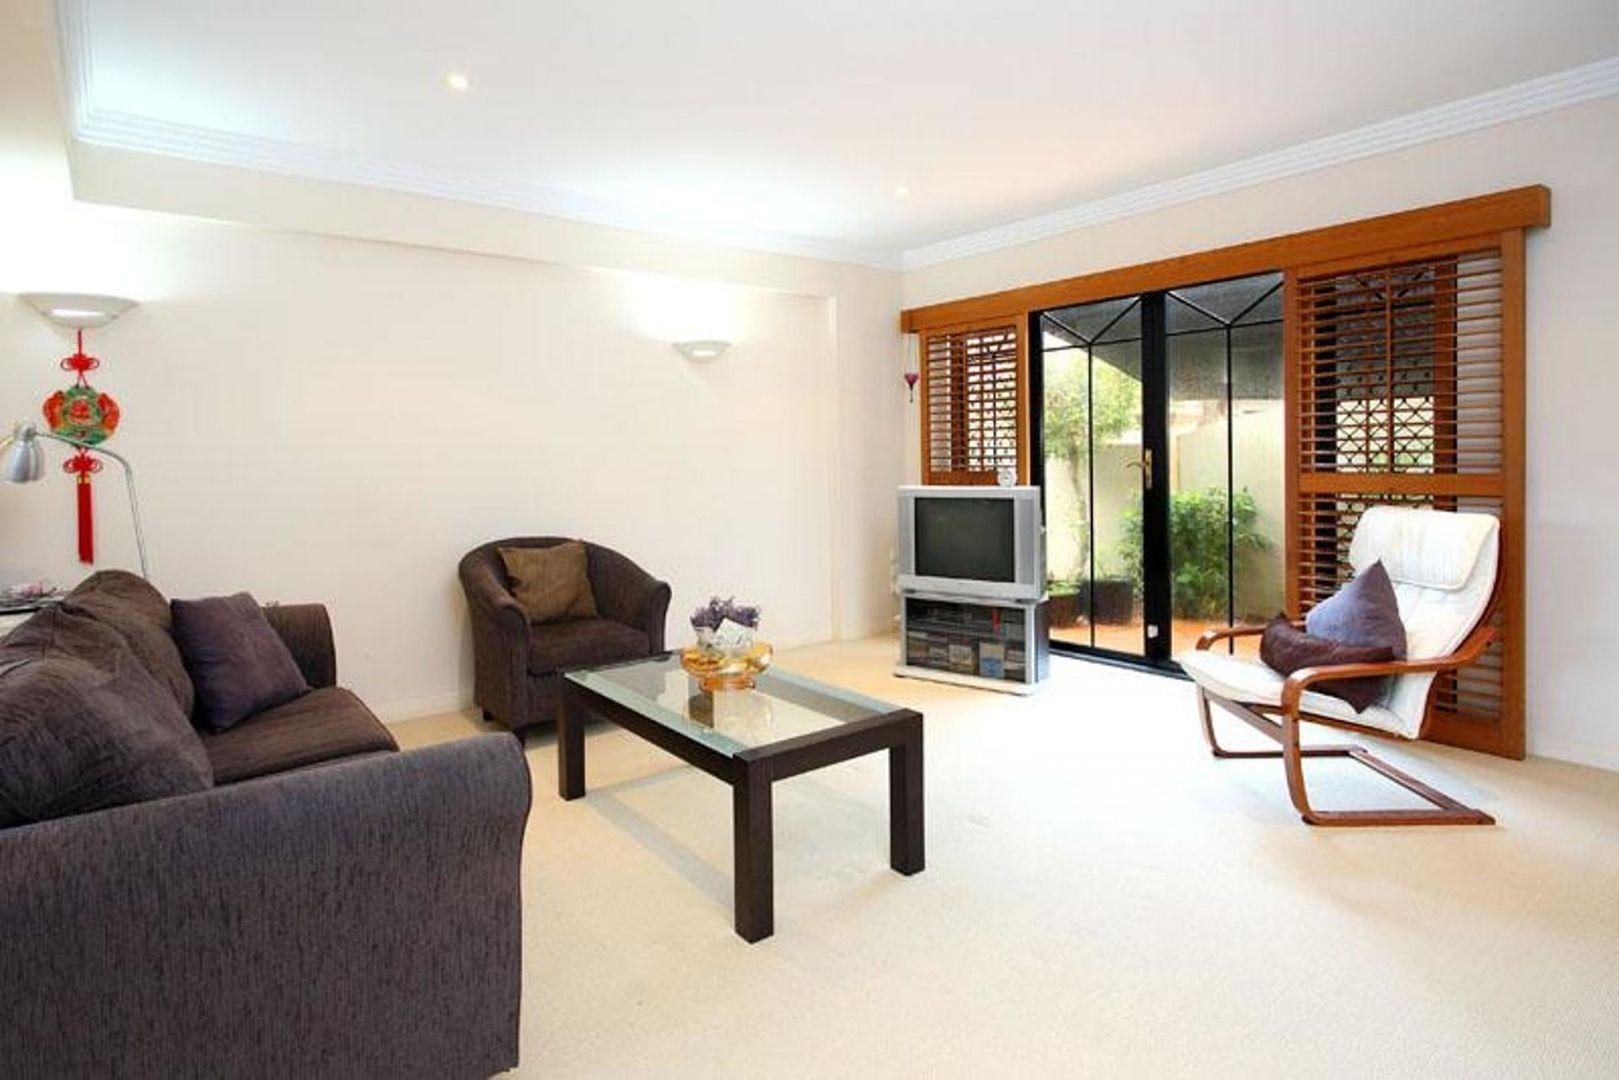 18/24 Radan St, Sunnybank Hills QLD 4109, Image 1